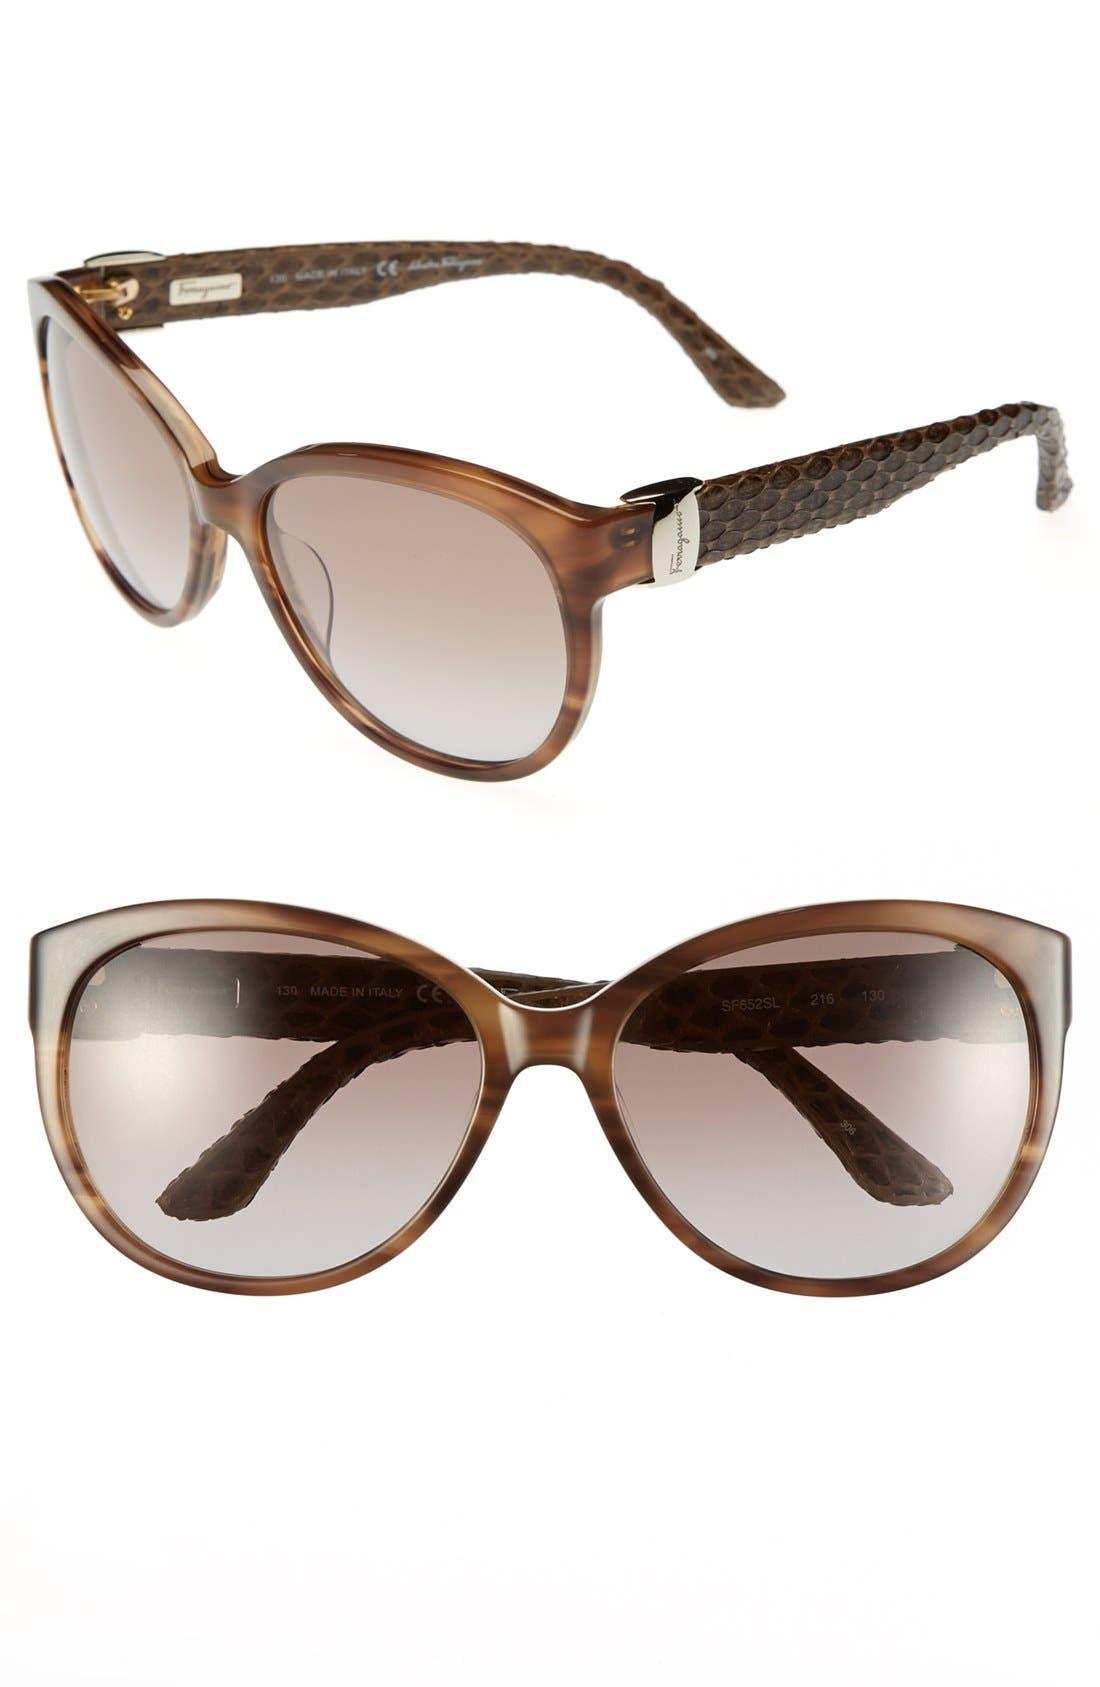 Alternate Image 1 Selected - Salvatore Ferragamo 'Vara' 59mm Sunglasses